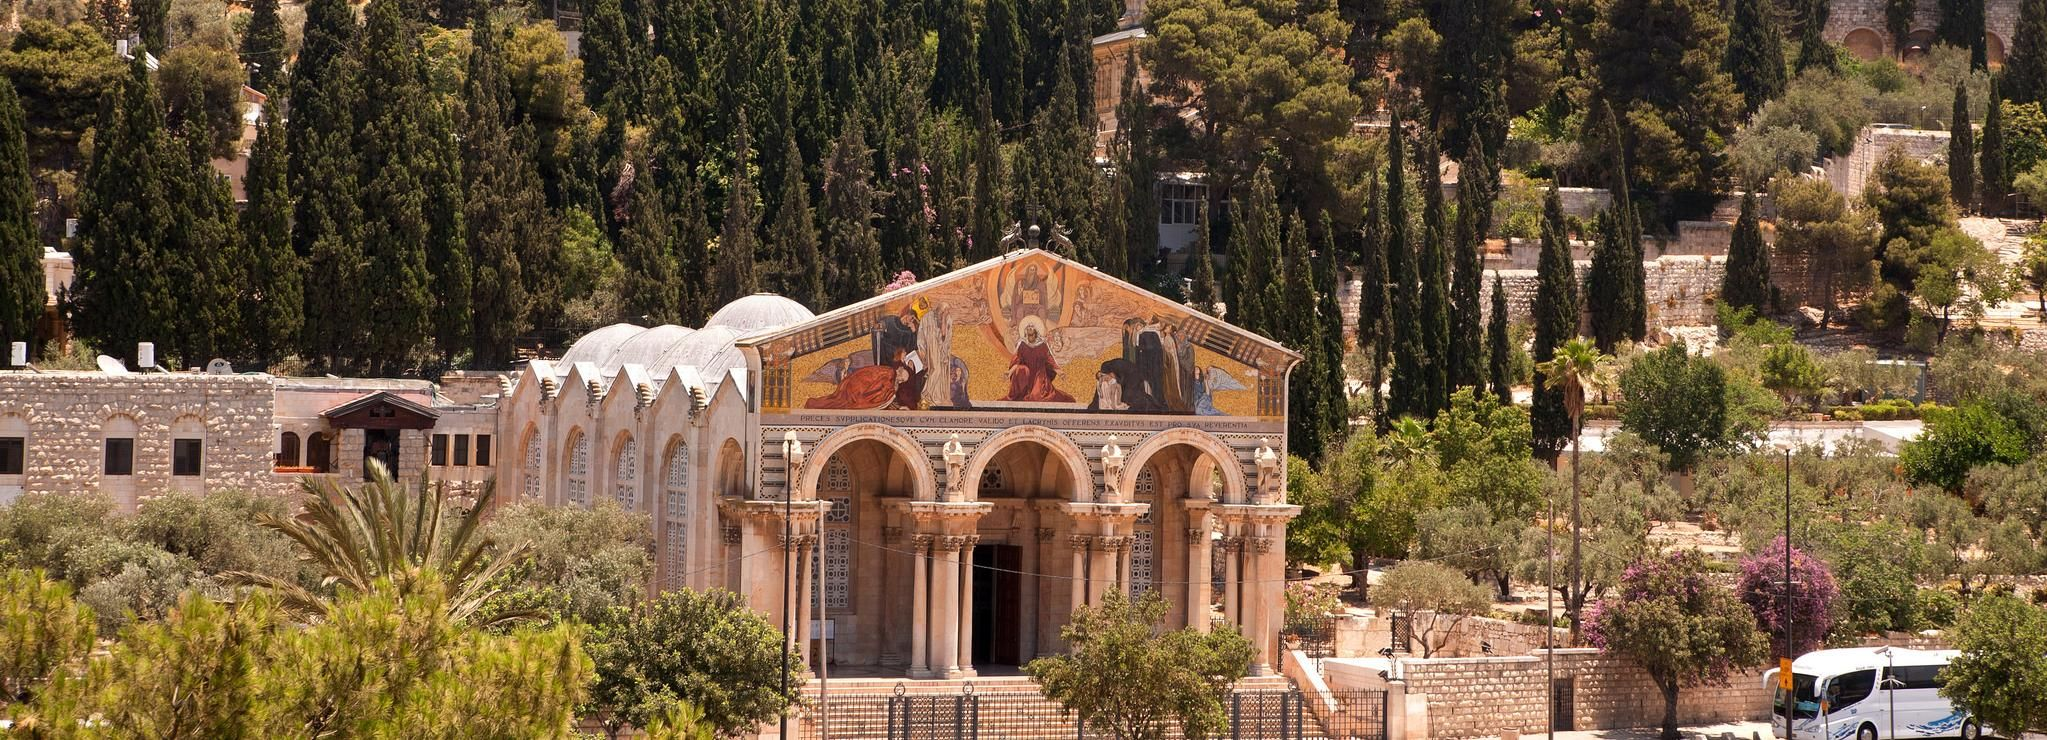 Tel Aviv/Jerusalem: Christmas in Bethlehem and Jerusalem